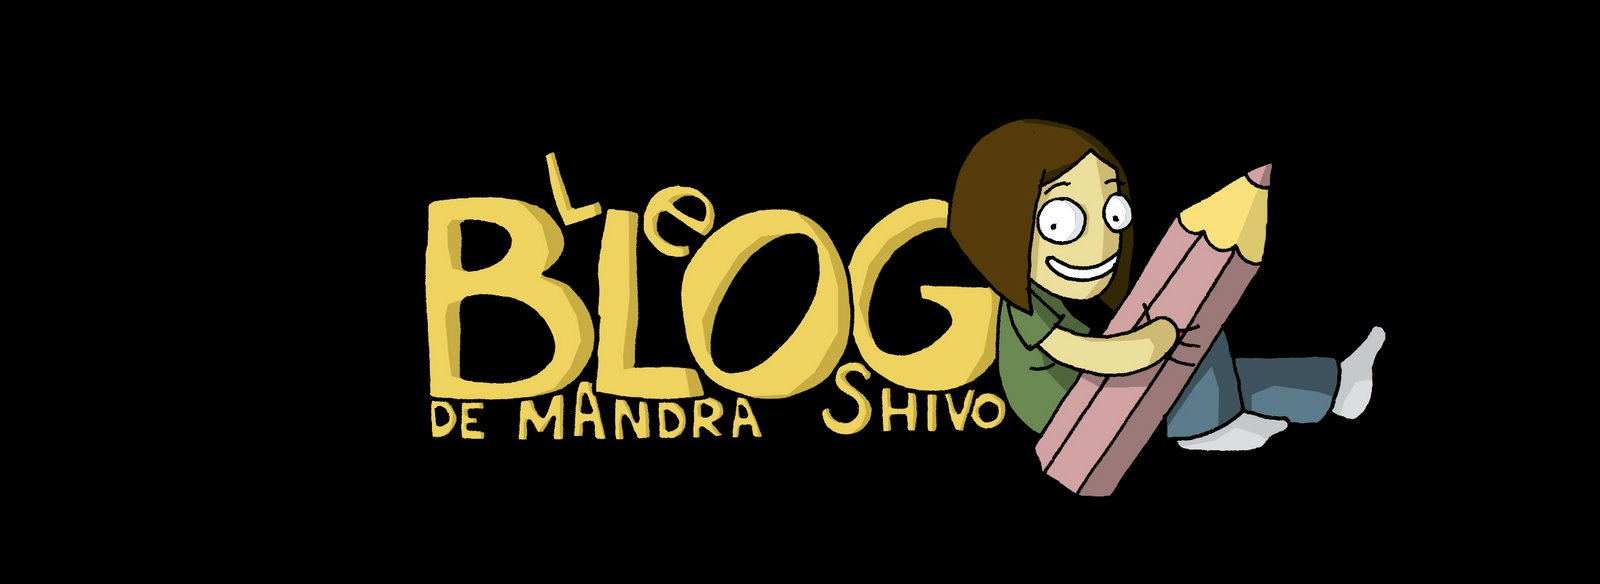 Le Blog de Mandra Shivo